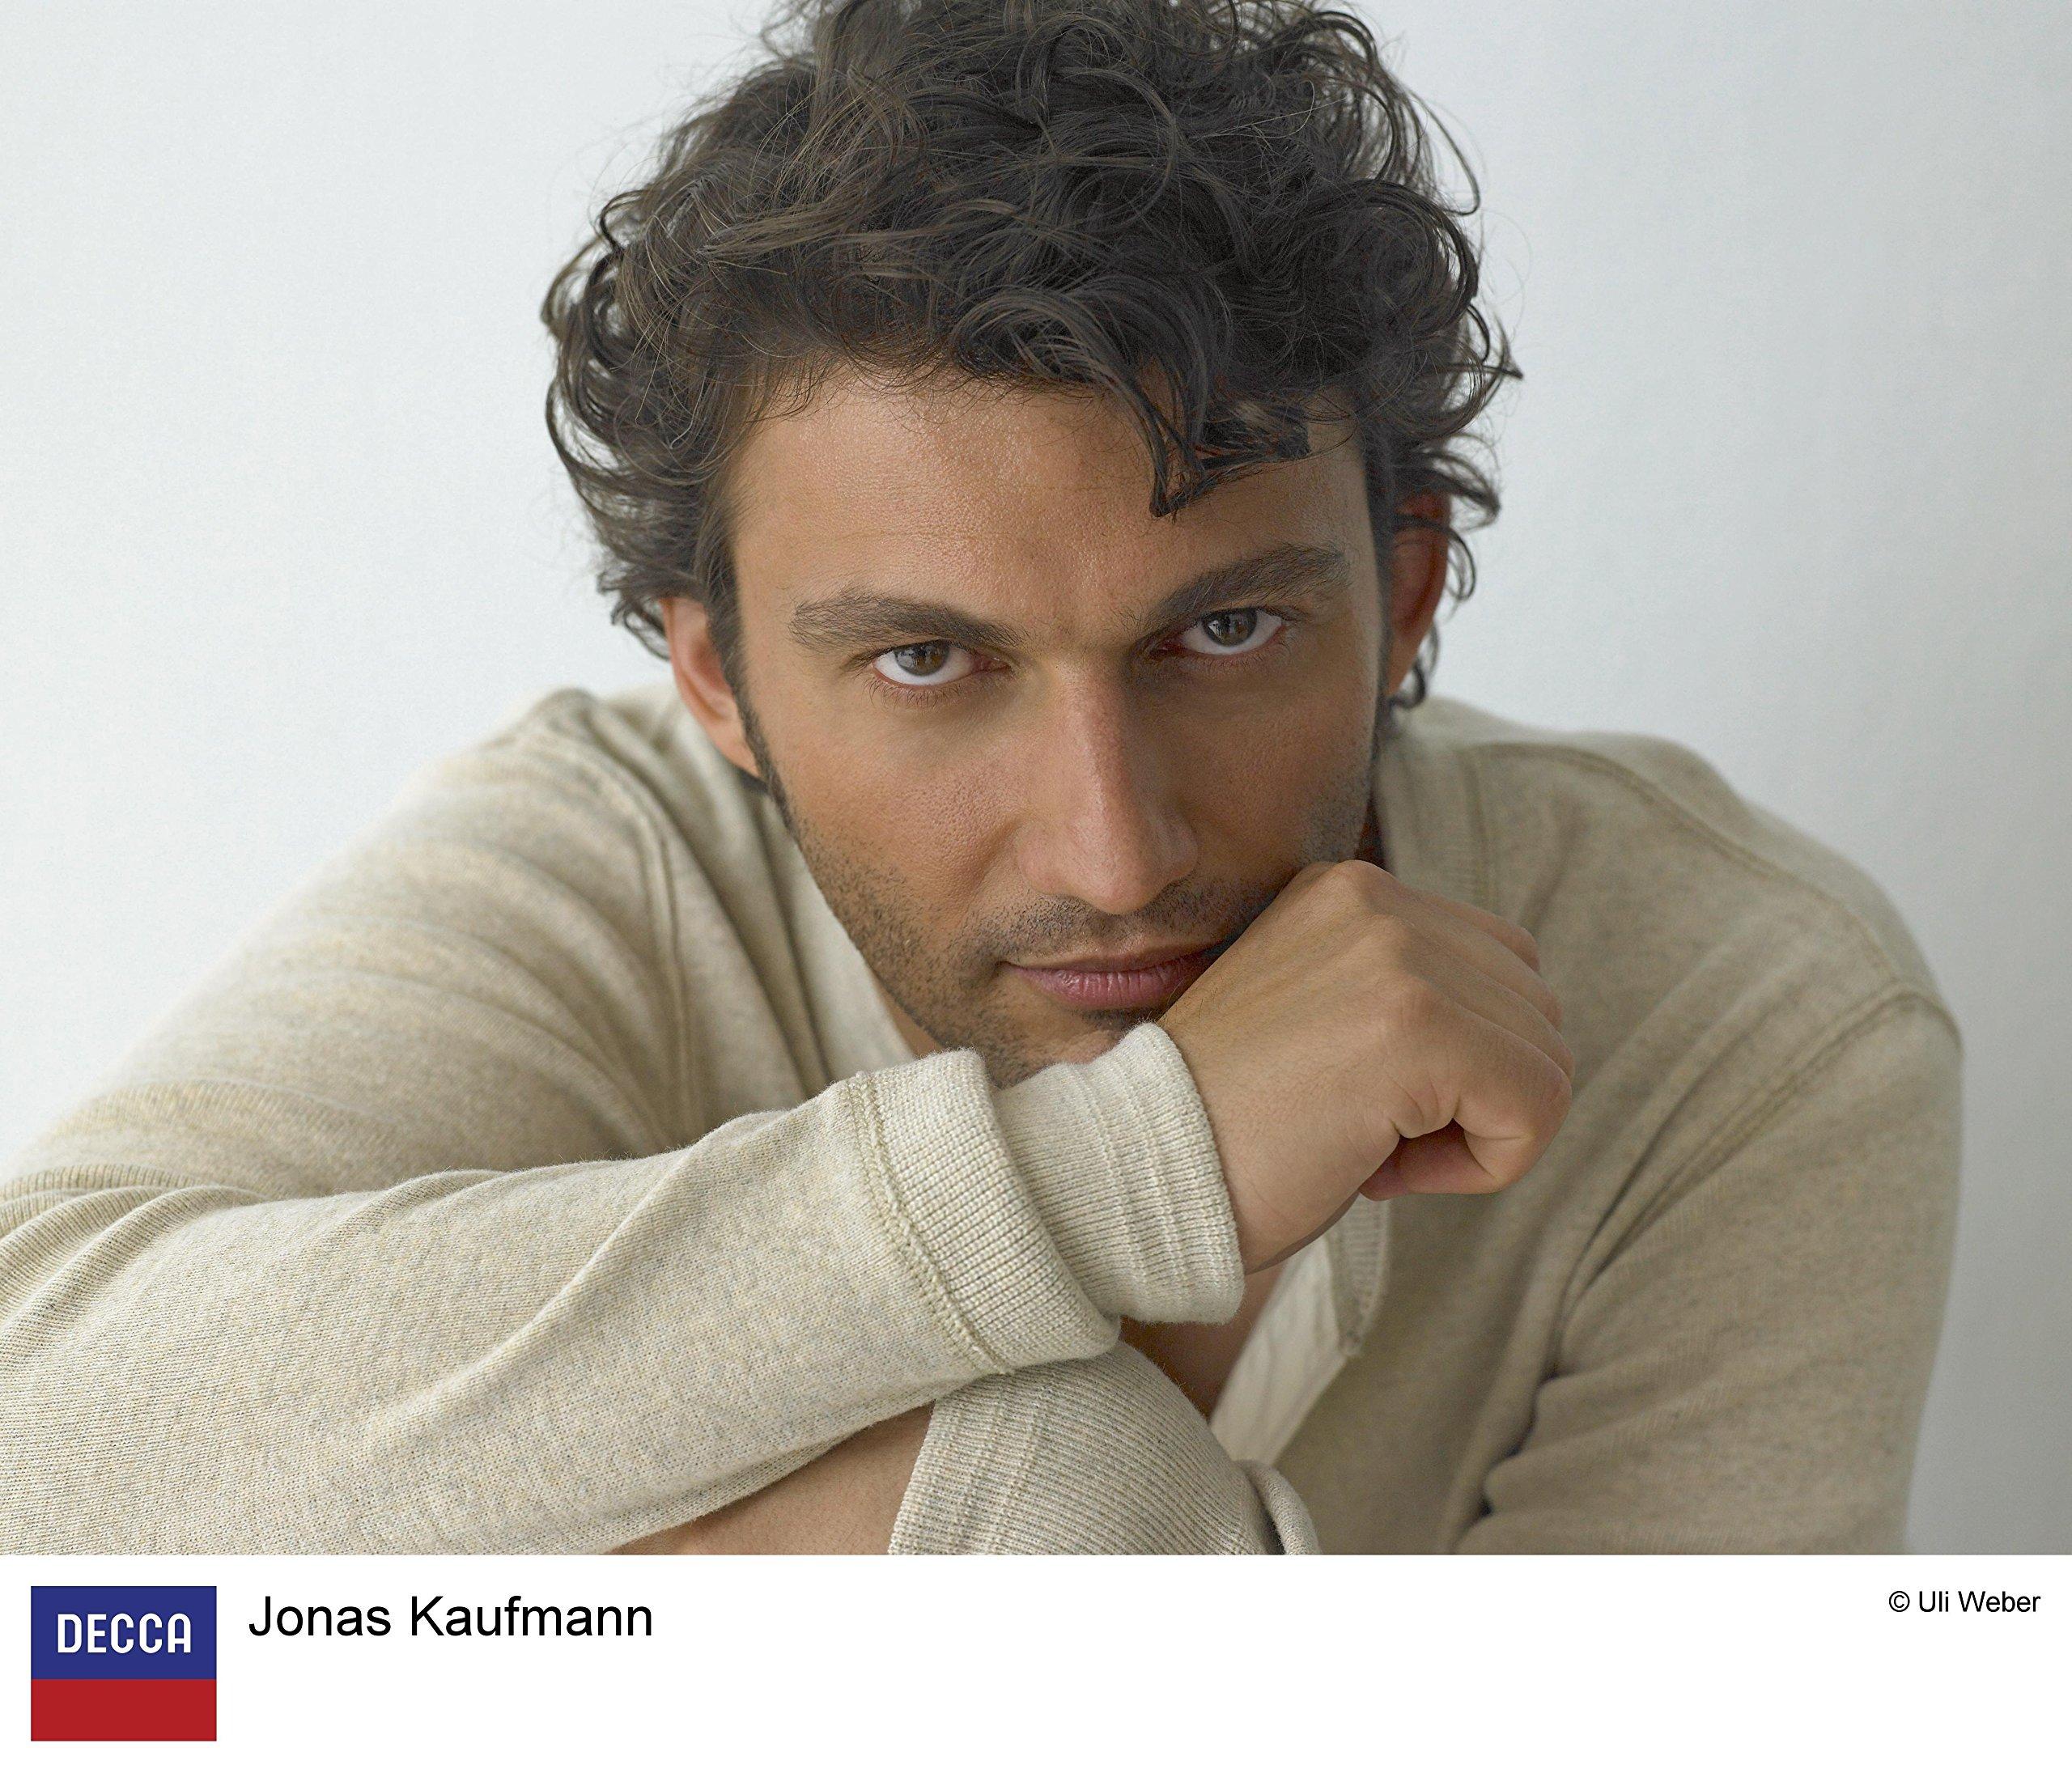 Jonas Kaufmann - 50 Great Arias [4 CD] by Decca (Image #3)